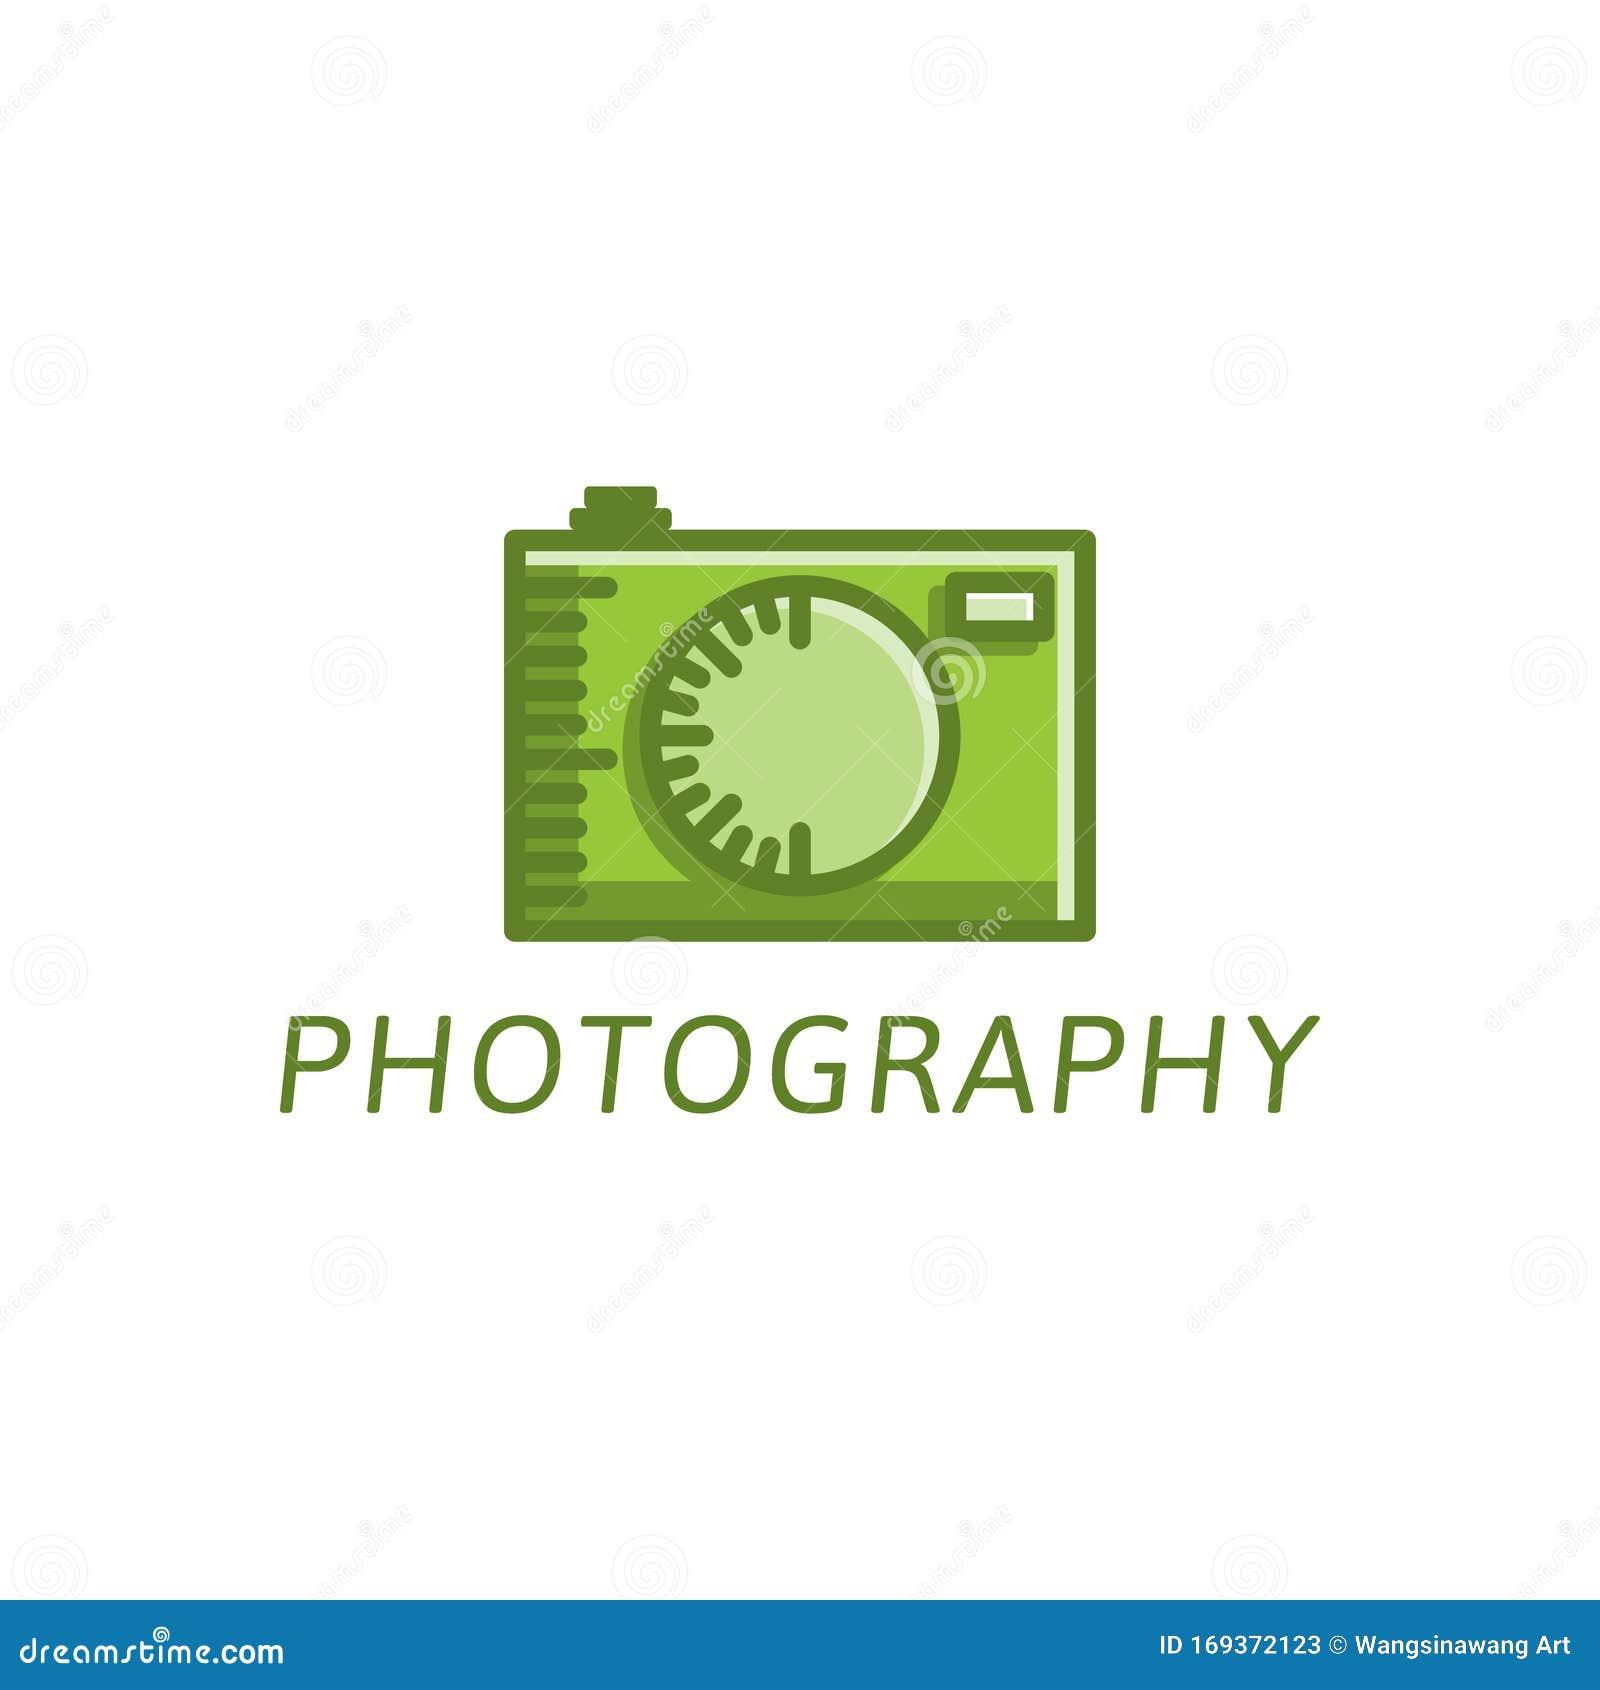 Lens Camera Photography Logo Ideas Inspiration Logo Design Template Vector Illustration Isolated On White Background Stock Vector Illustration Of Photographer Creative 169372123